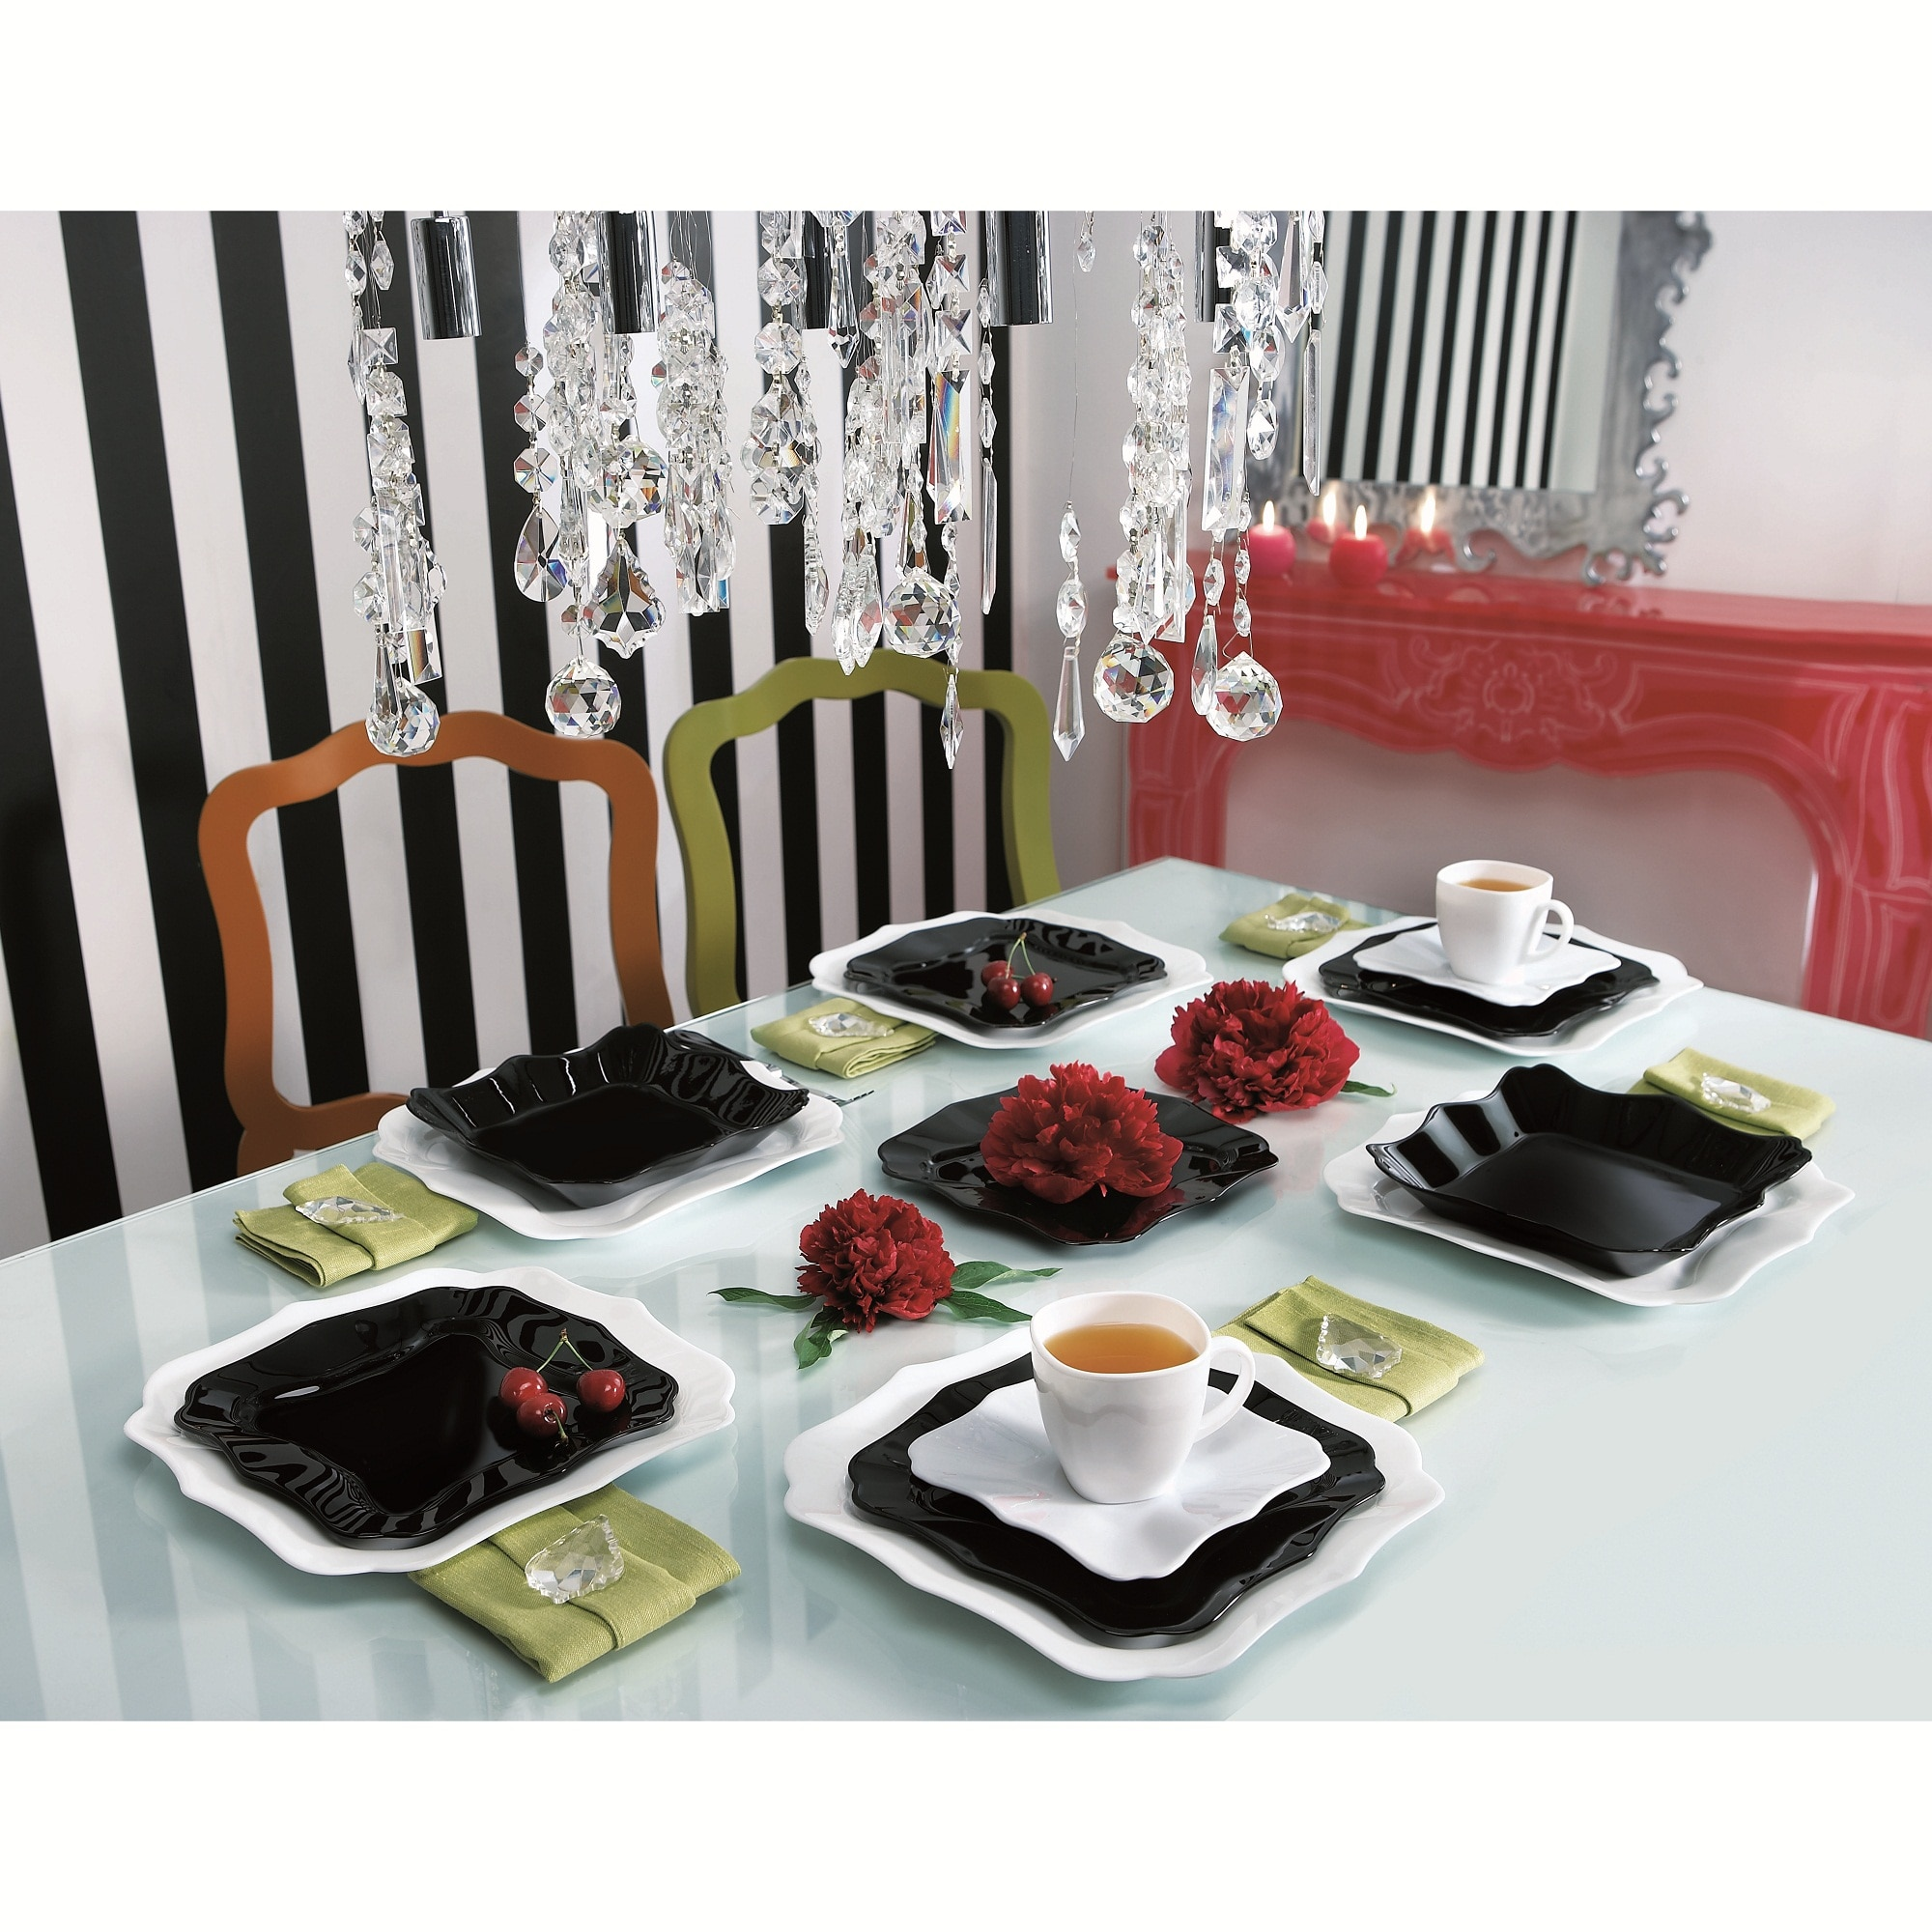 Fotografie Serviciu de masa Luminarc Authentic, 30 piese, model patrat alb/negru